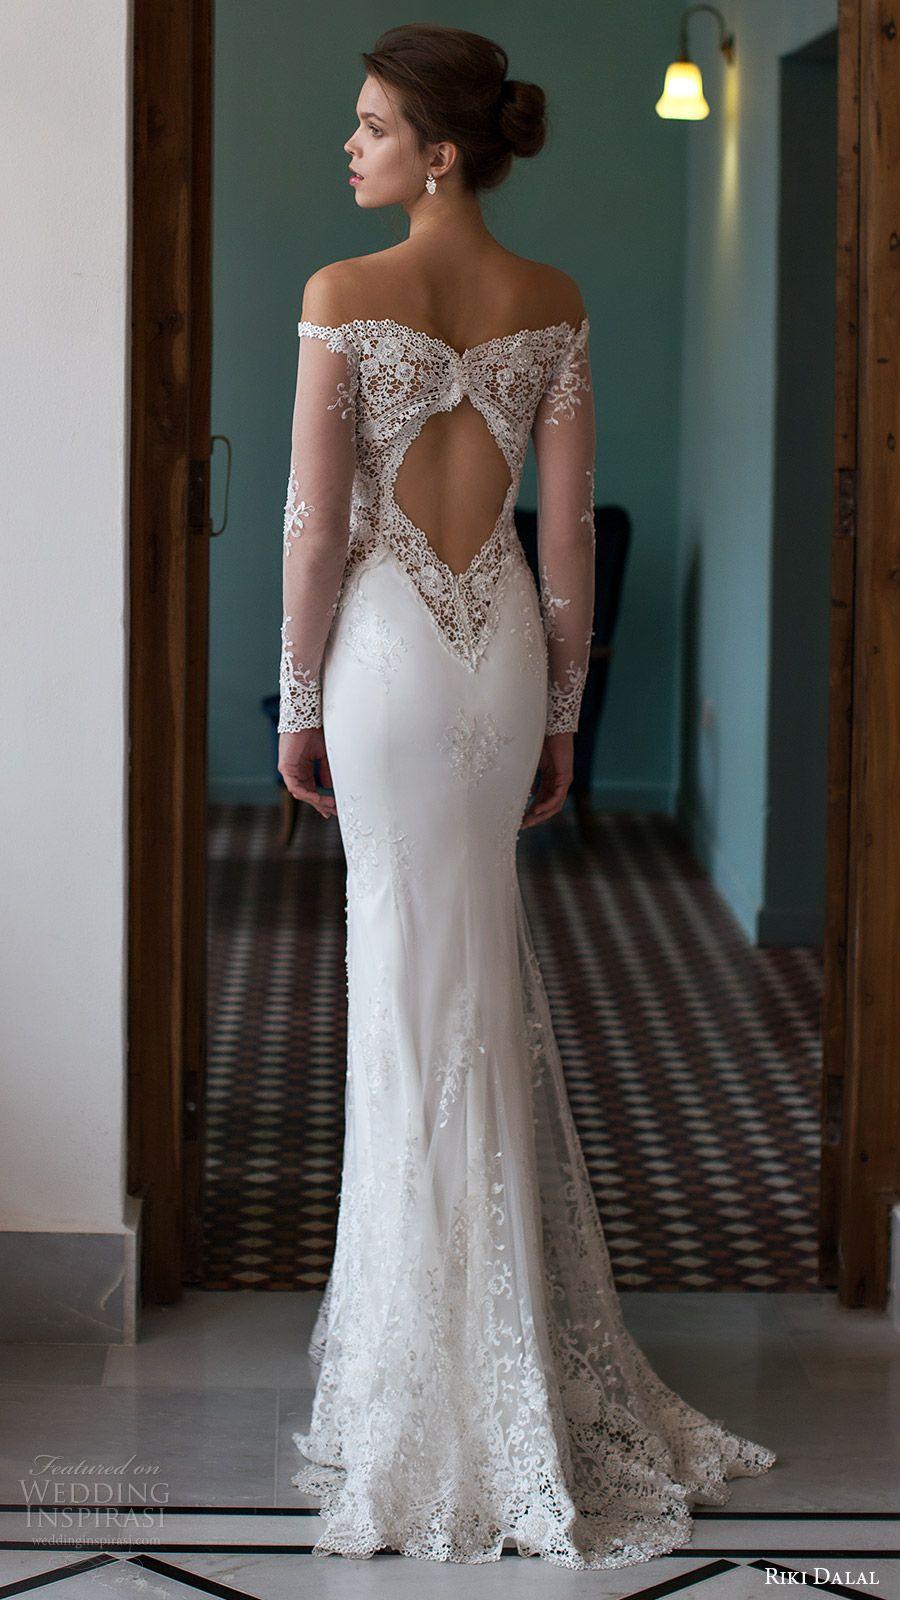 Riki dalal wedding dresses u ucveronaud bridal collection